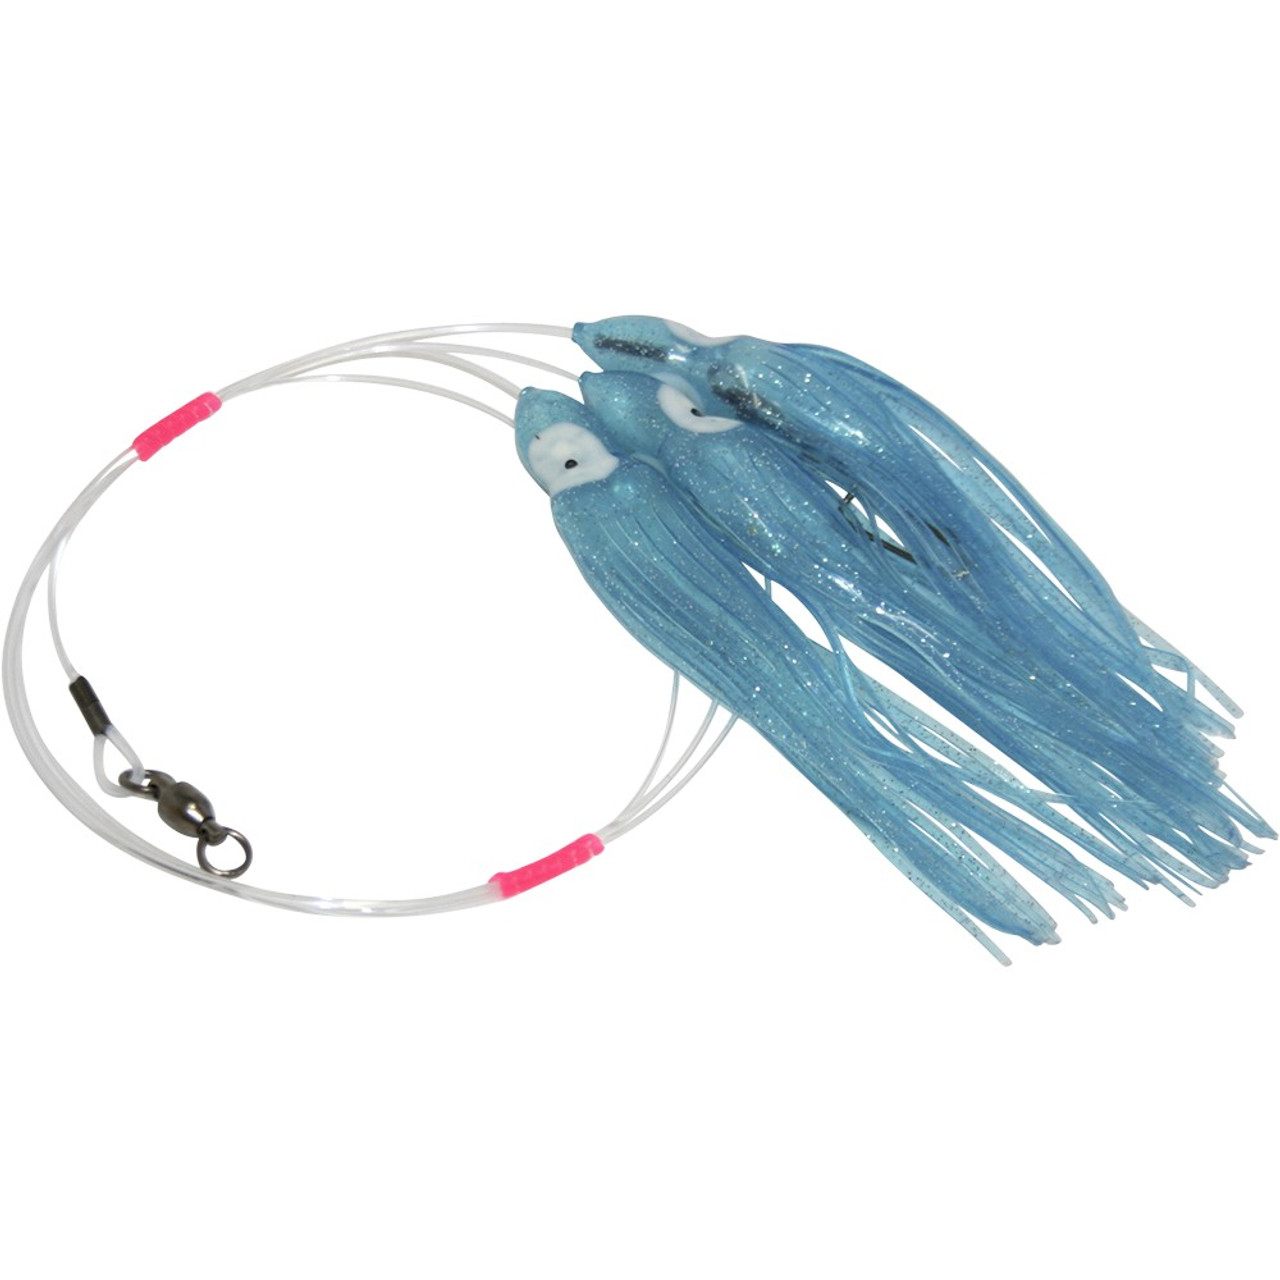 Ono Whaoo Sailfish Daisy Chain Leader Silver Sparkle Mahi Tuna Marlin